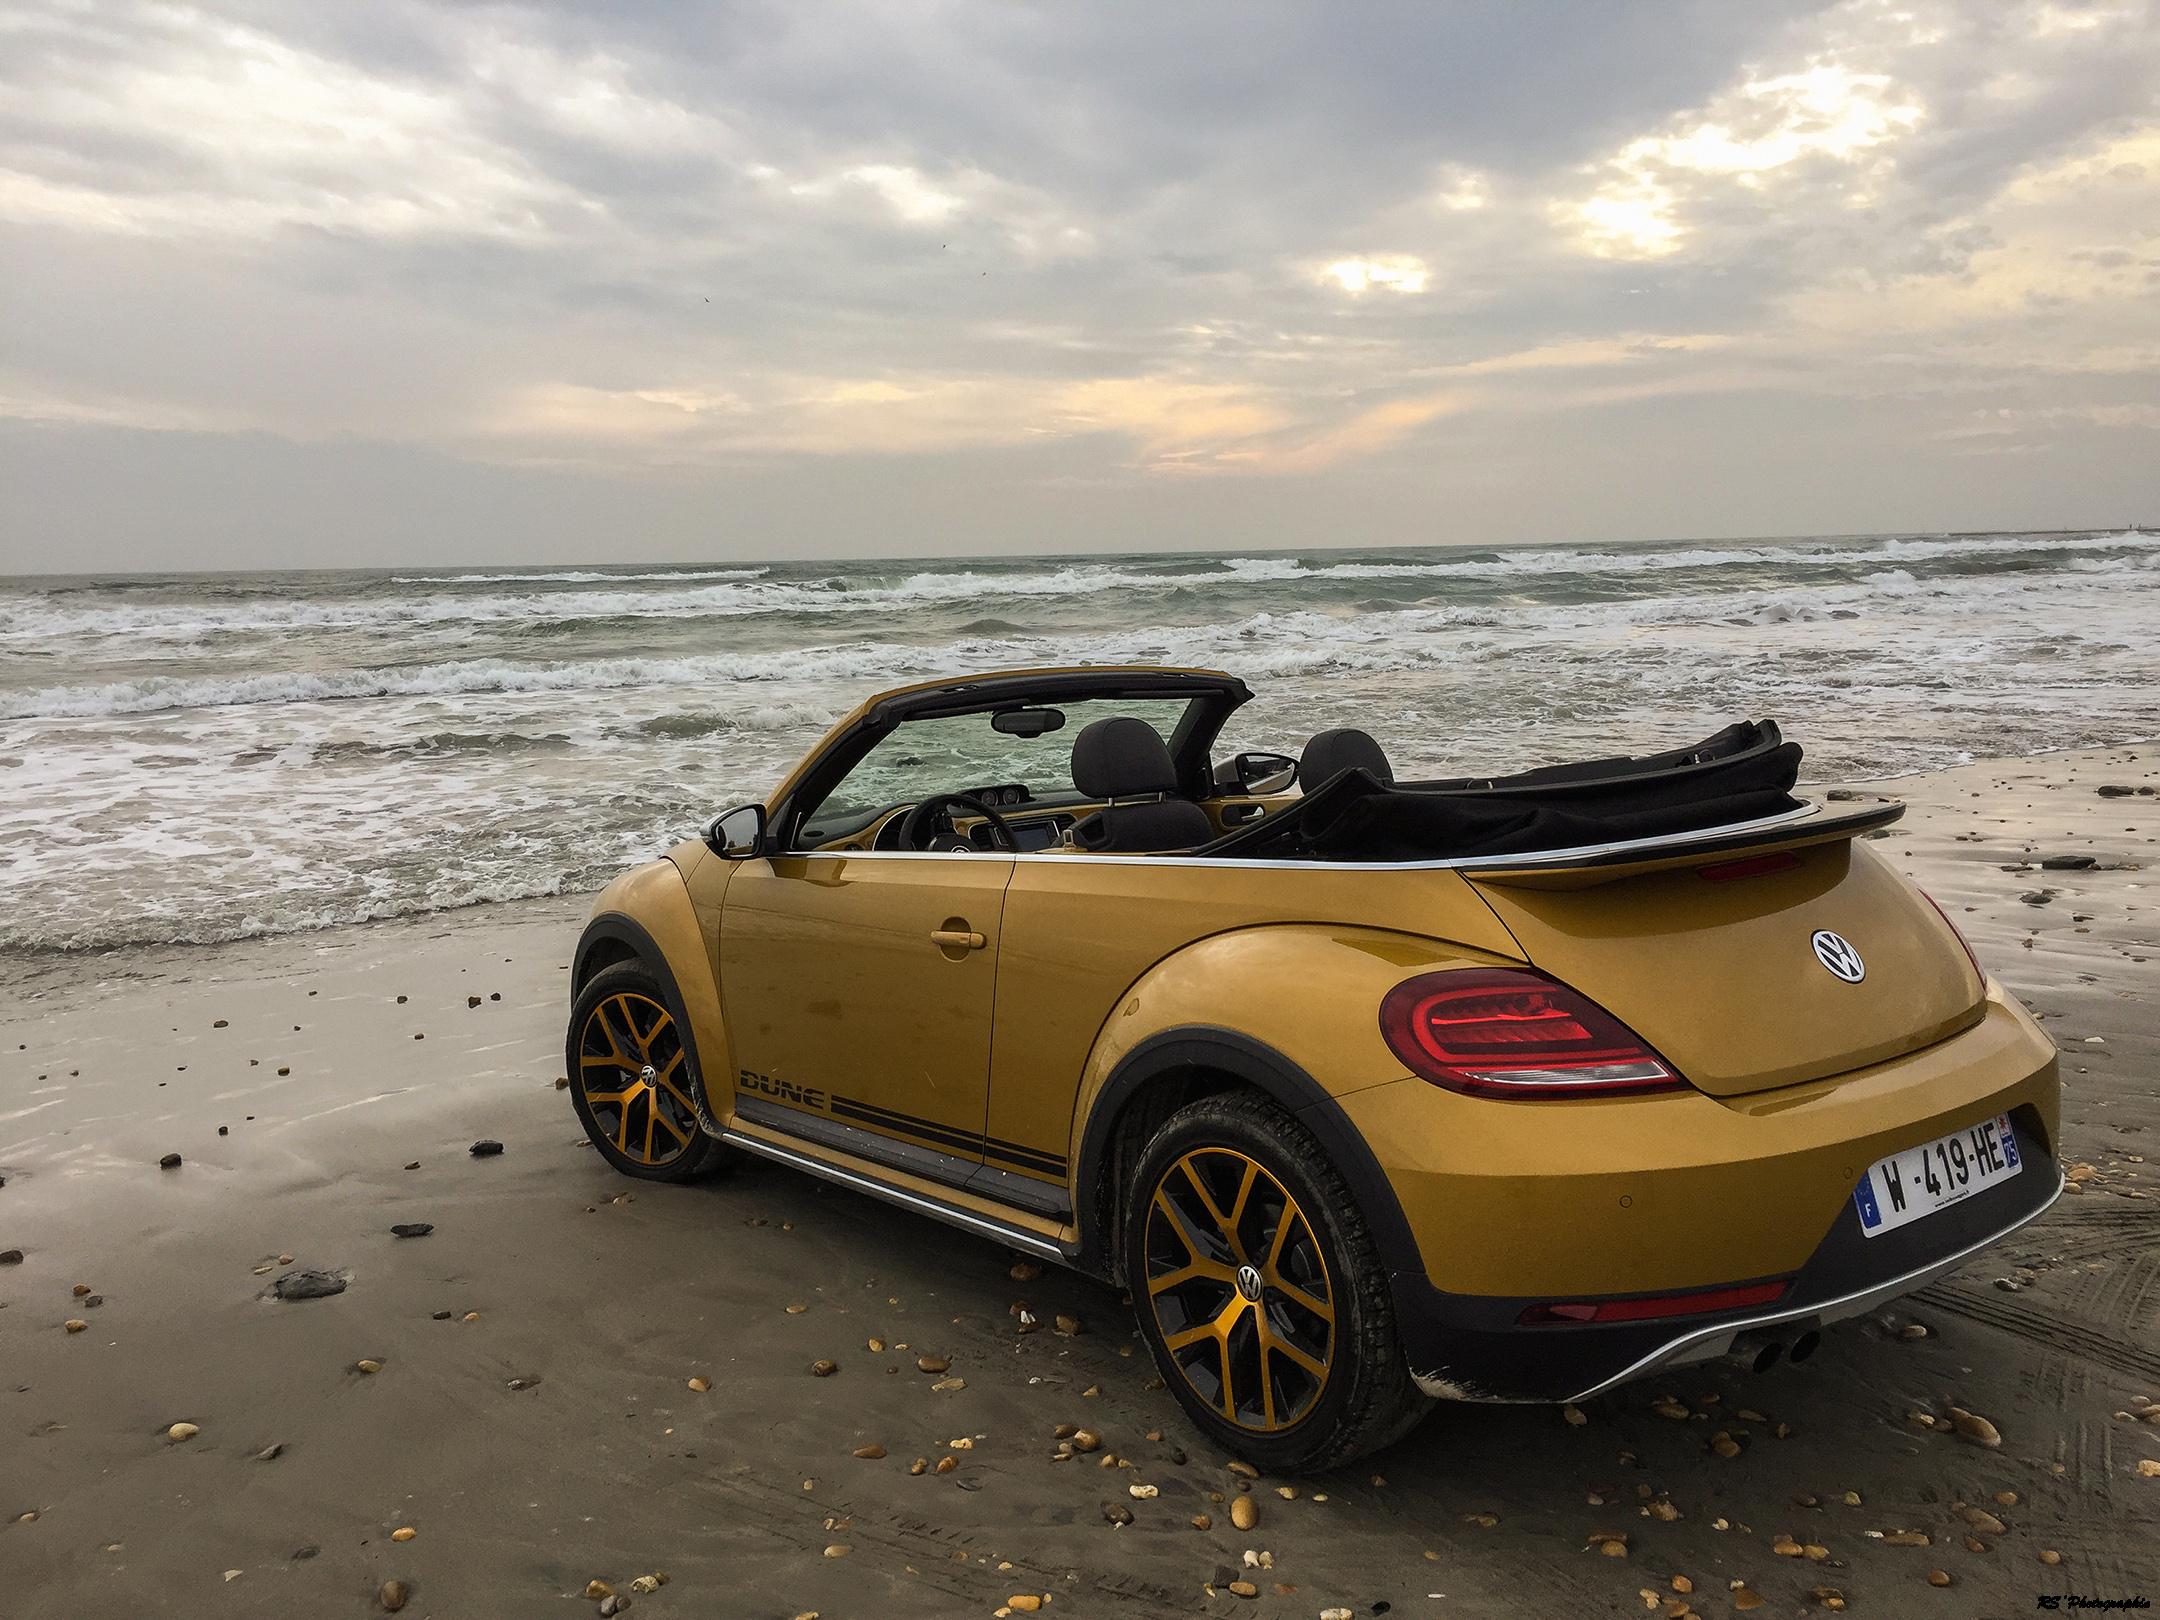 vwcox37-volkswagen-coccinelle-dune-cabriolet-arriere-rear-arnaud-demasier-rsphotographie